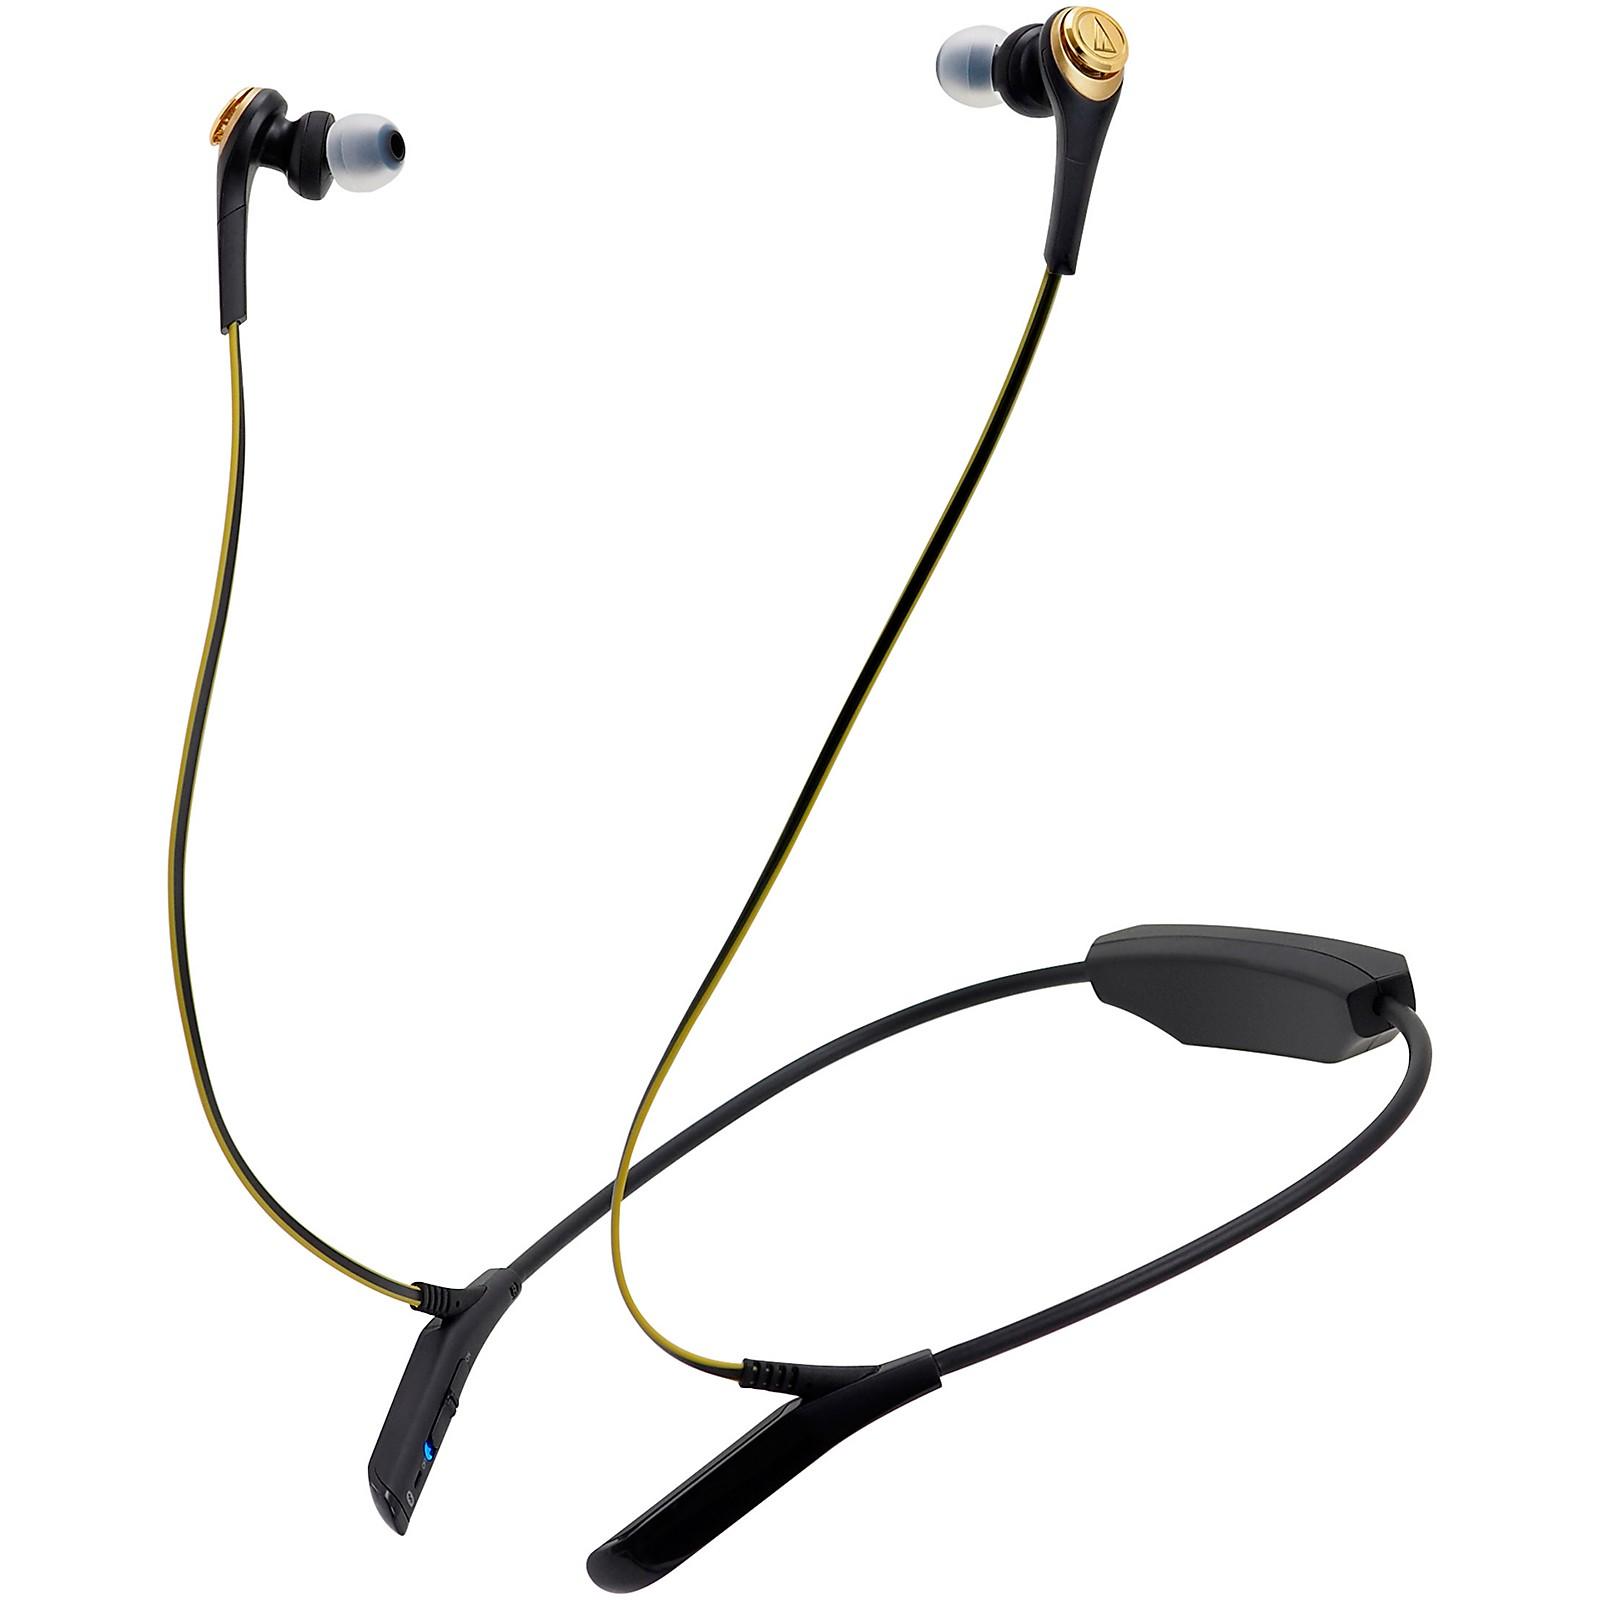 Open Box Audio-Technica Solid Bass In-Ear Bluetooth Headphones